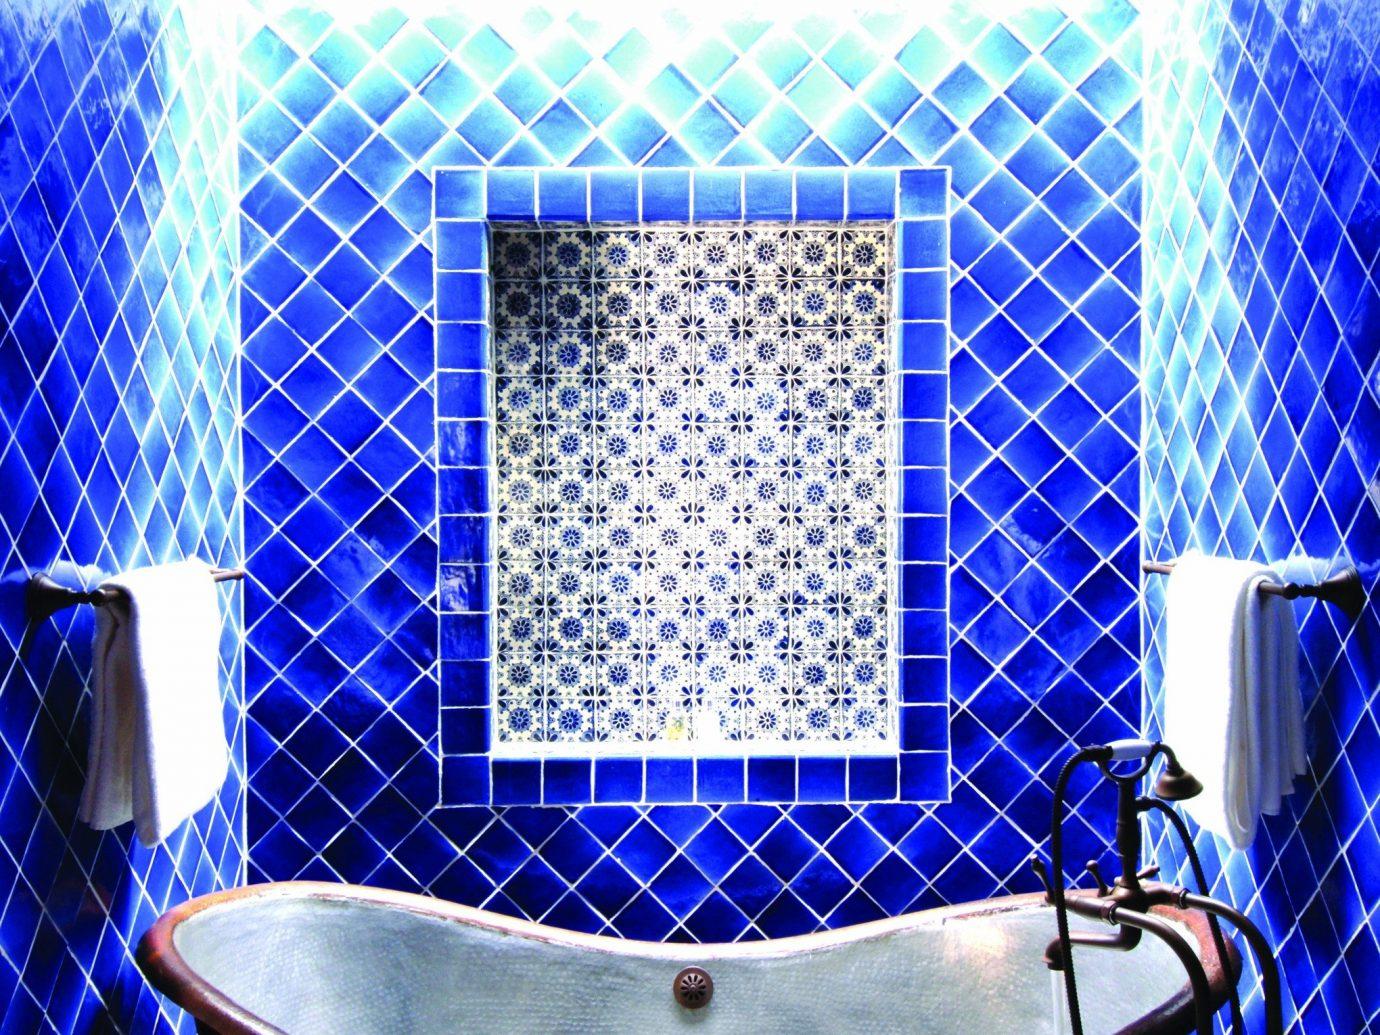 Hotels indoor blue light stage theatre Design lighting interior design shape screenshot space